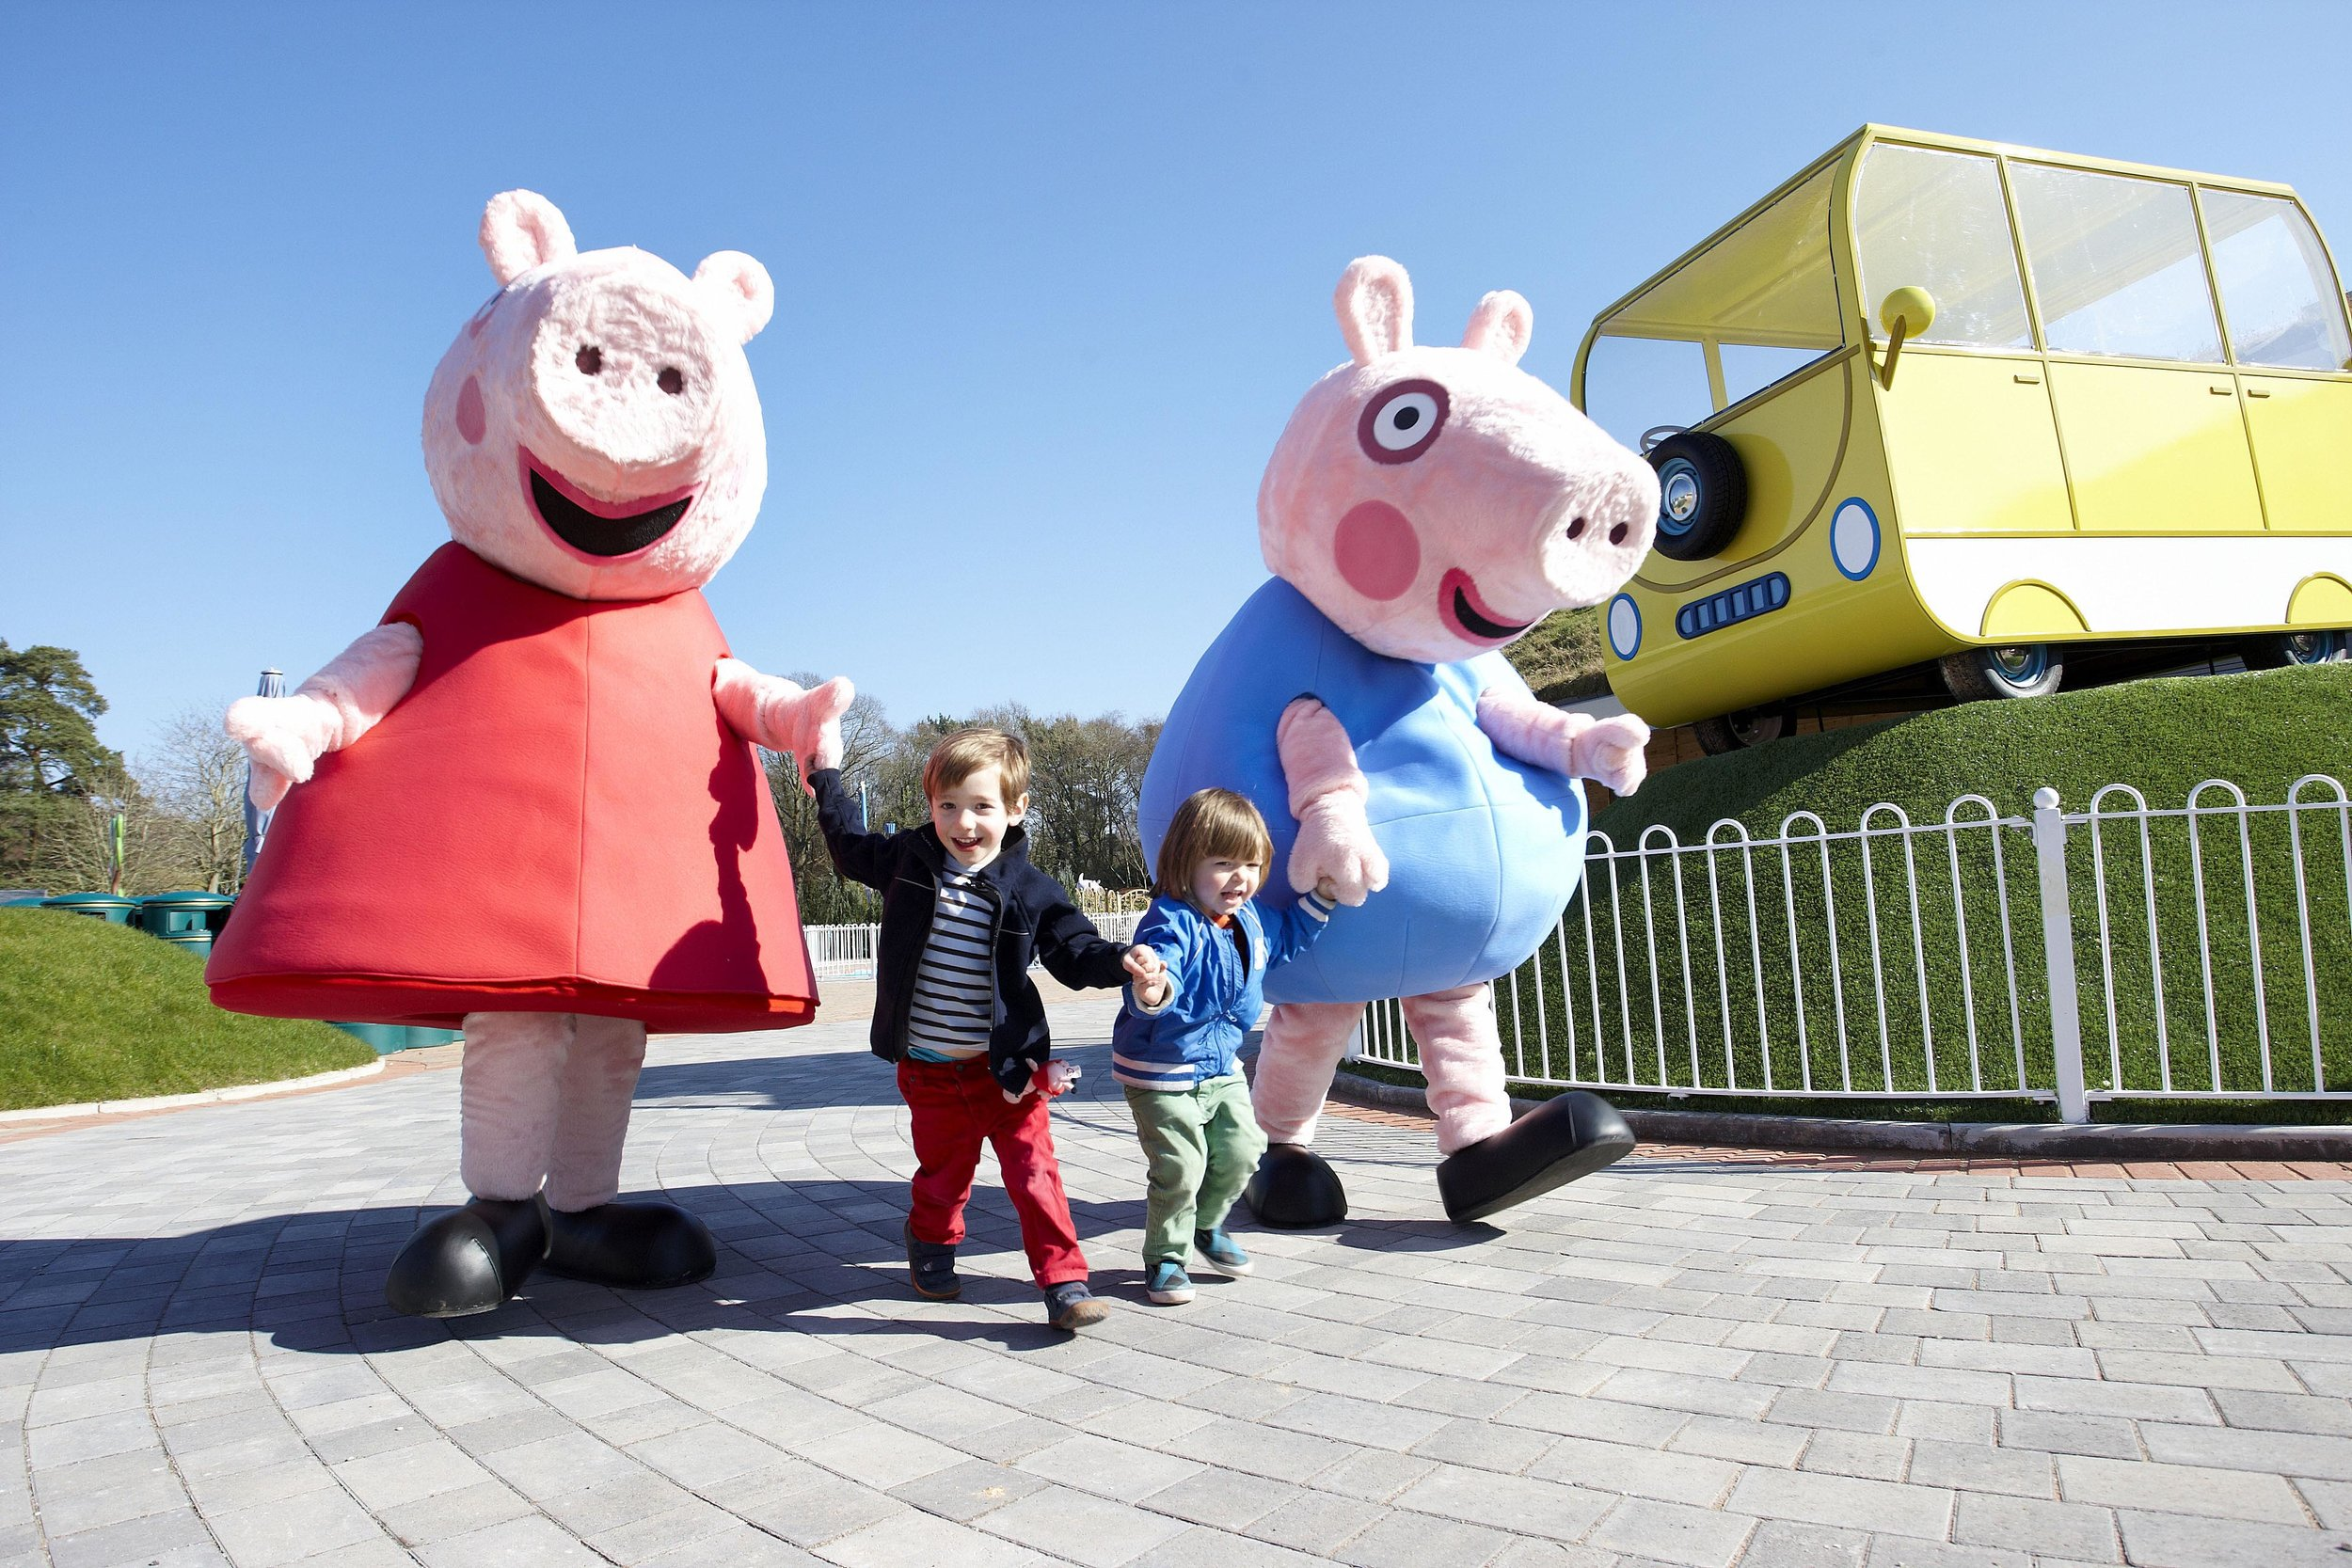 2011-03-07_Paultons-Park-Peppa-Pig-World_180-1.jpg